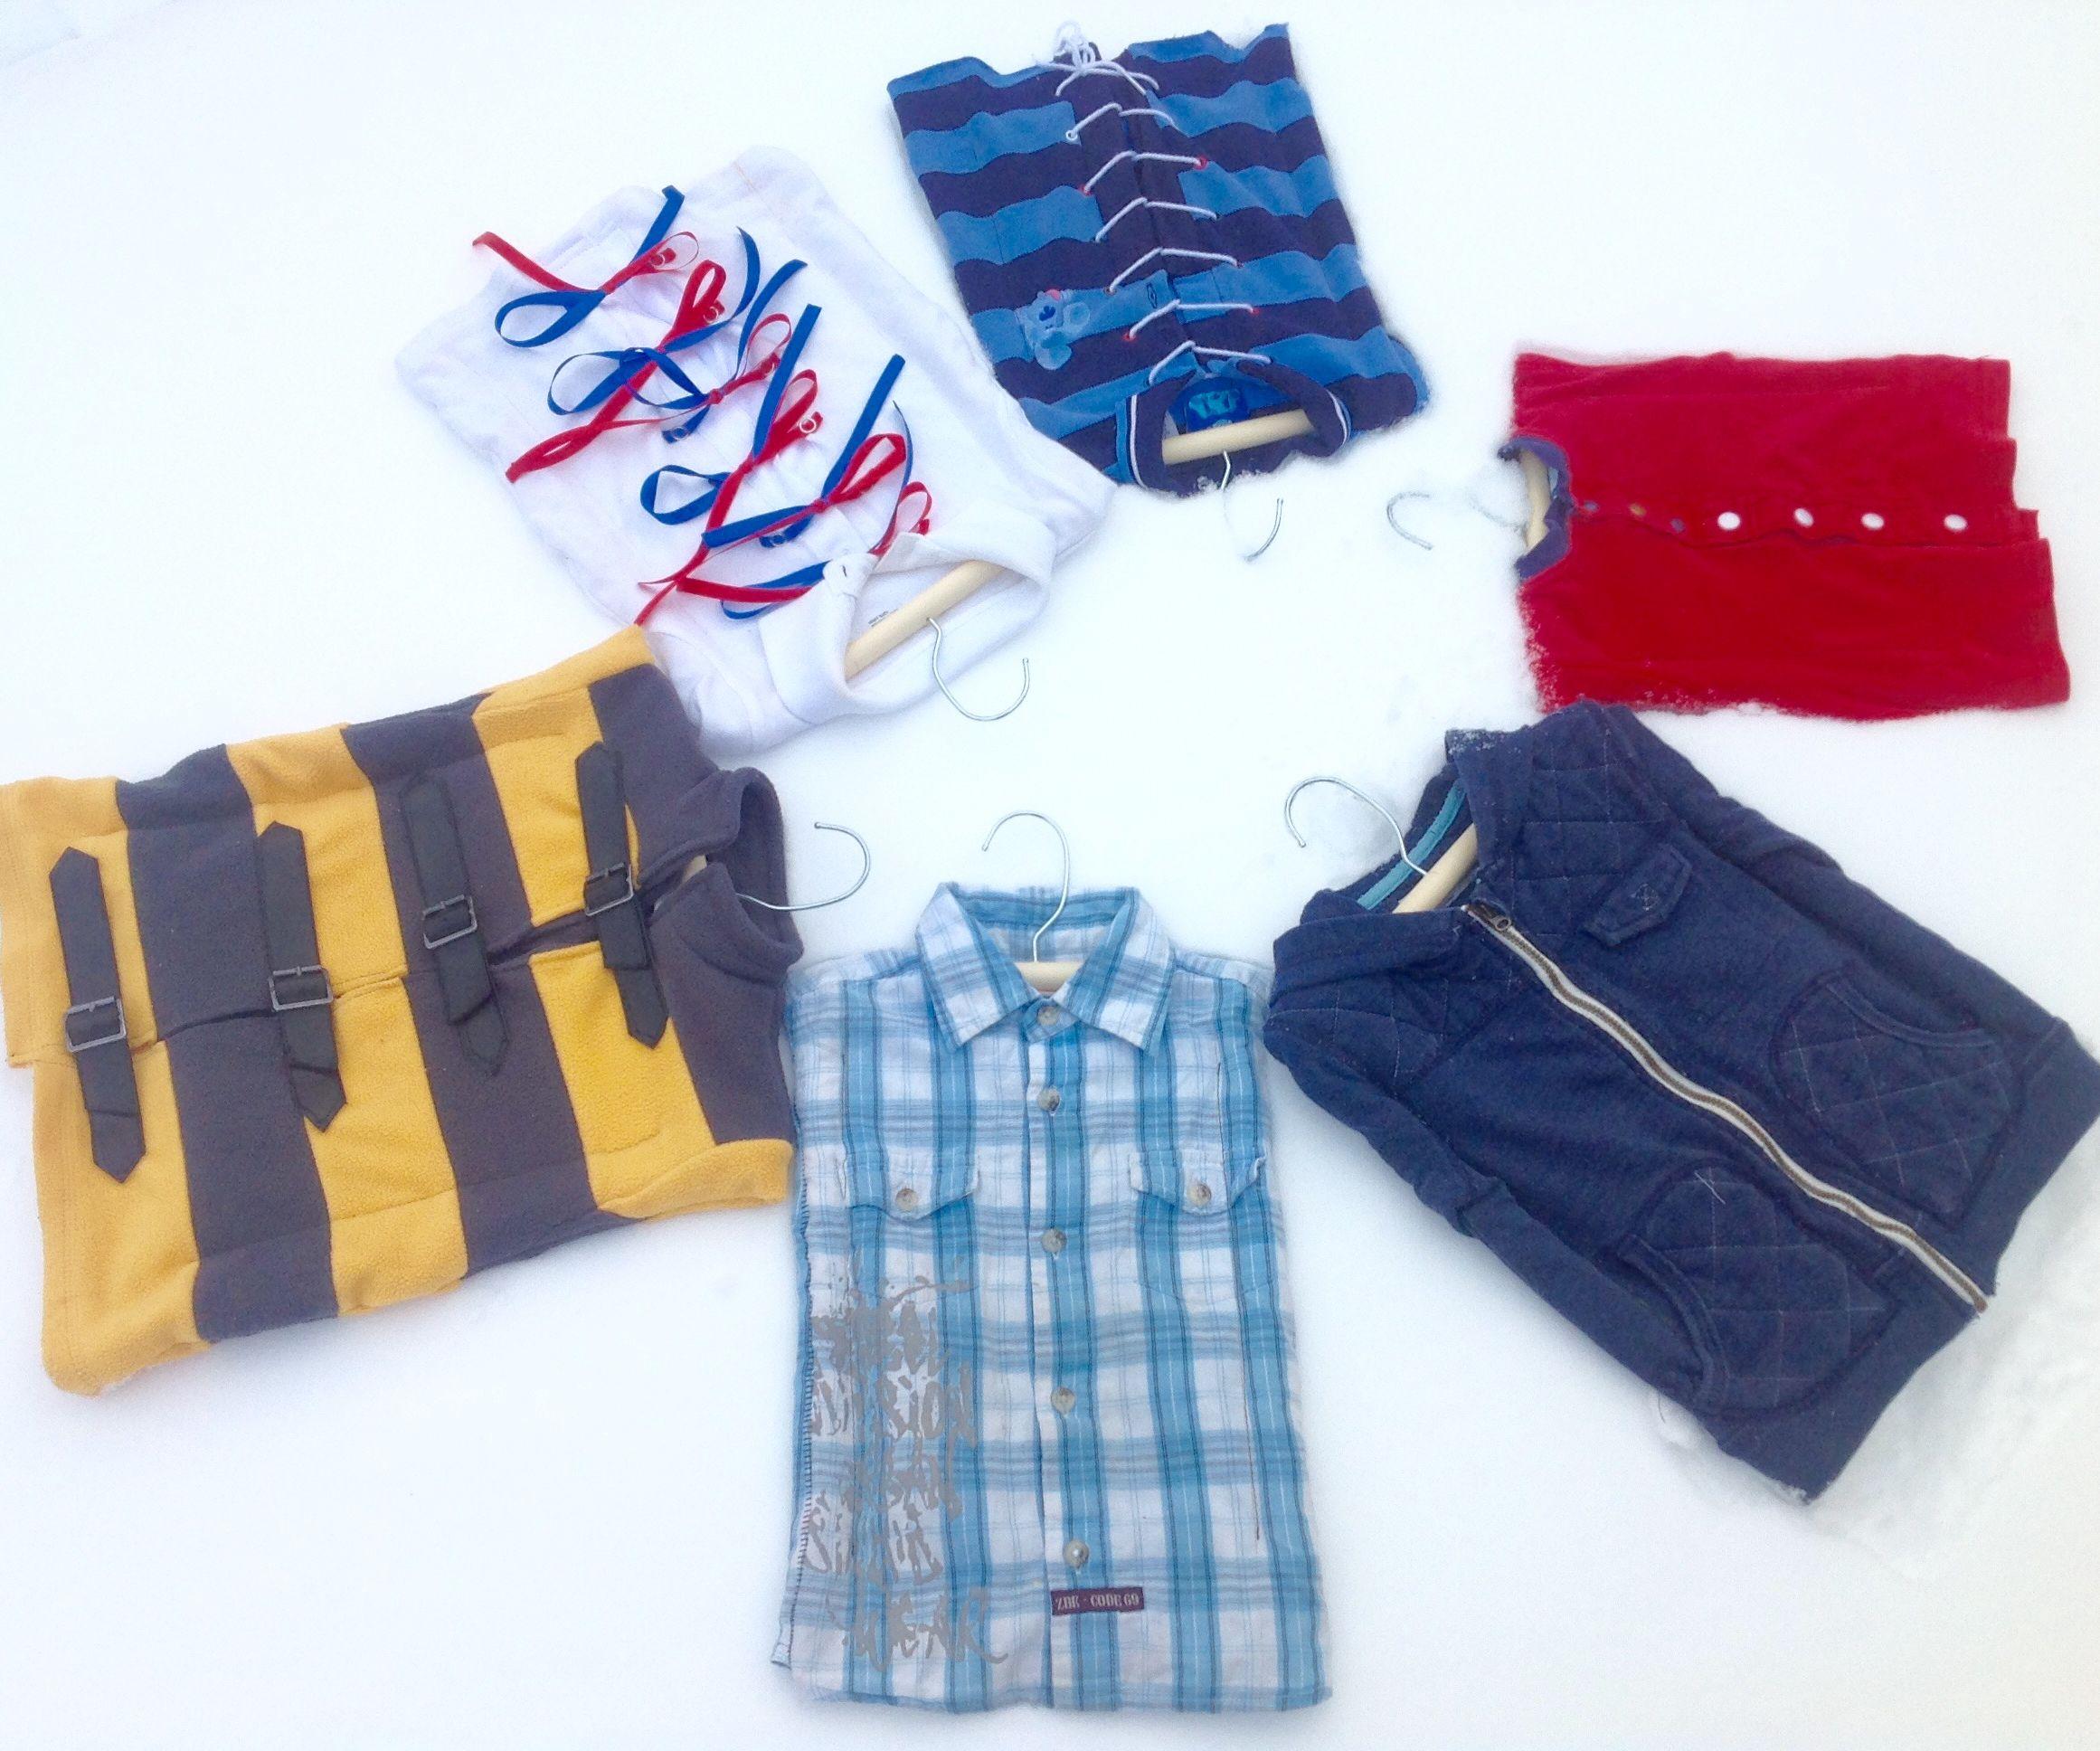 DIY Montessori Dressing Frames for Practical Life Skills